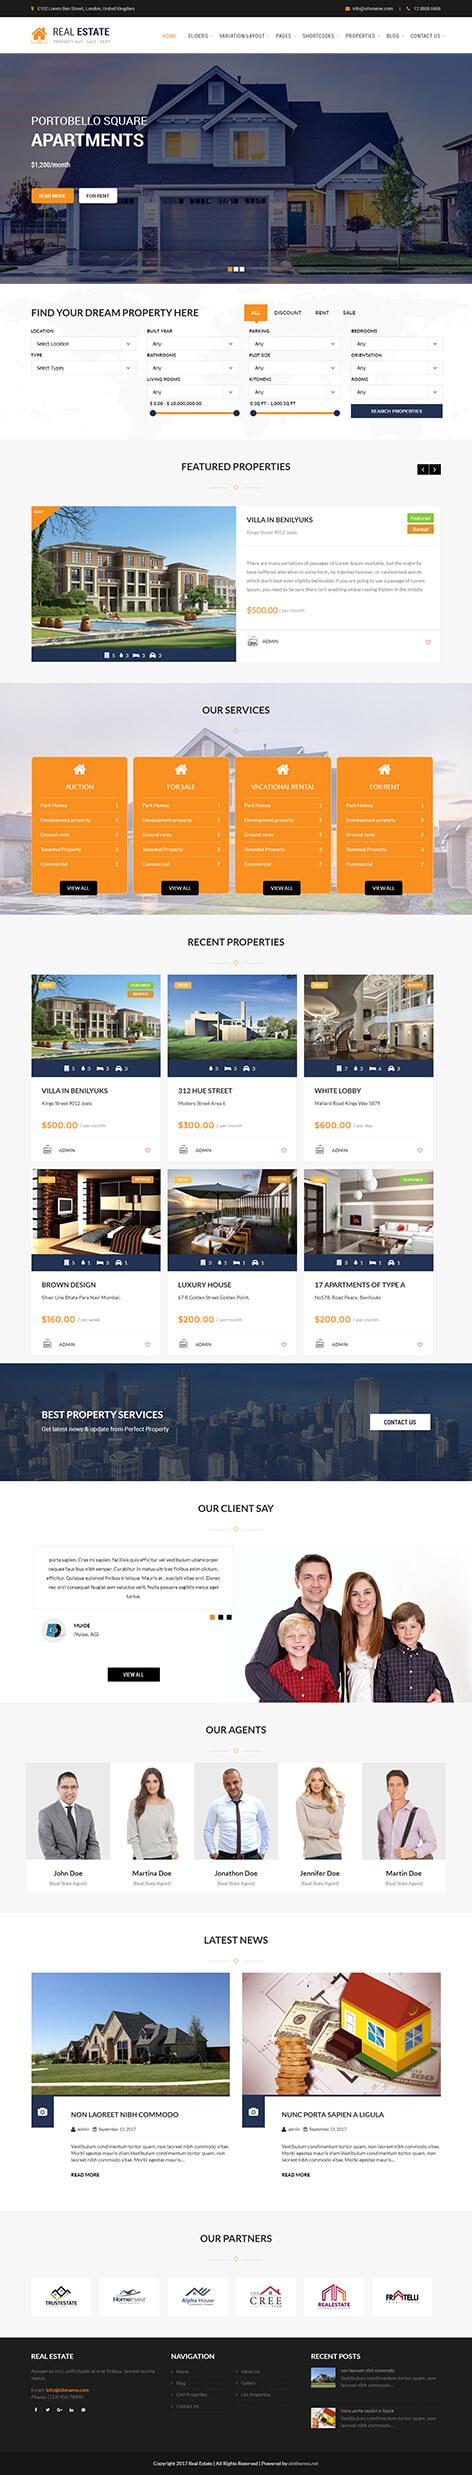 realestate screen 1 - Real Estate